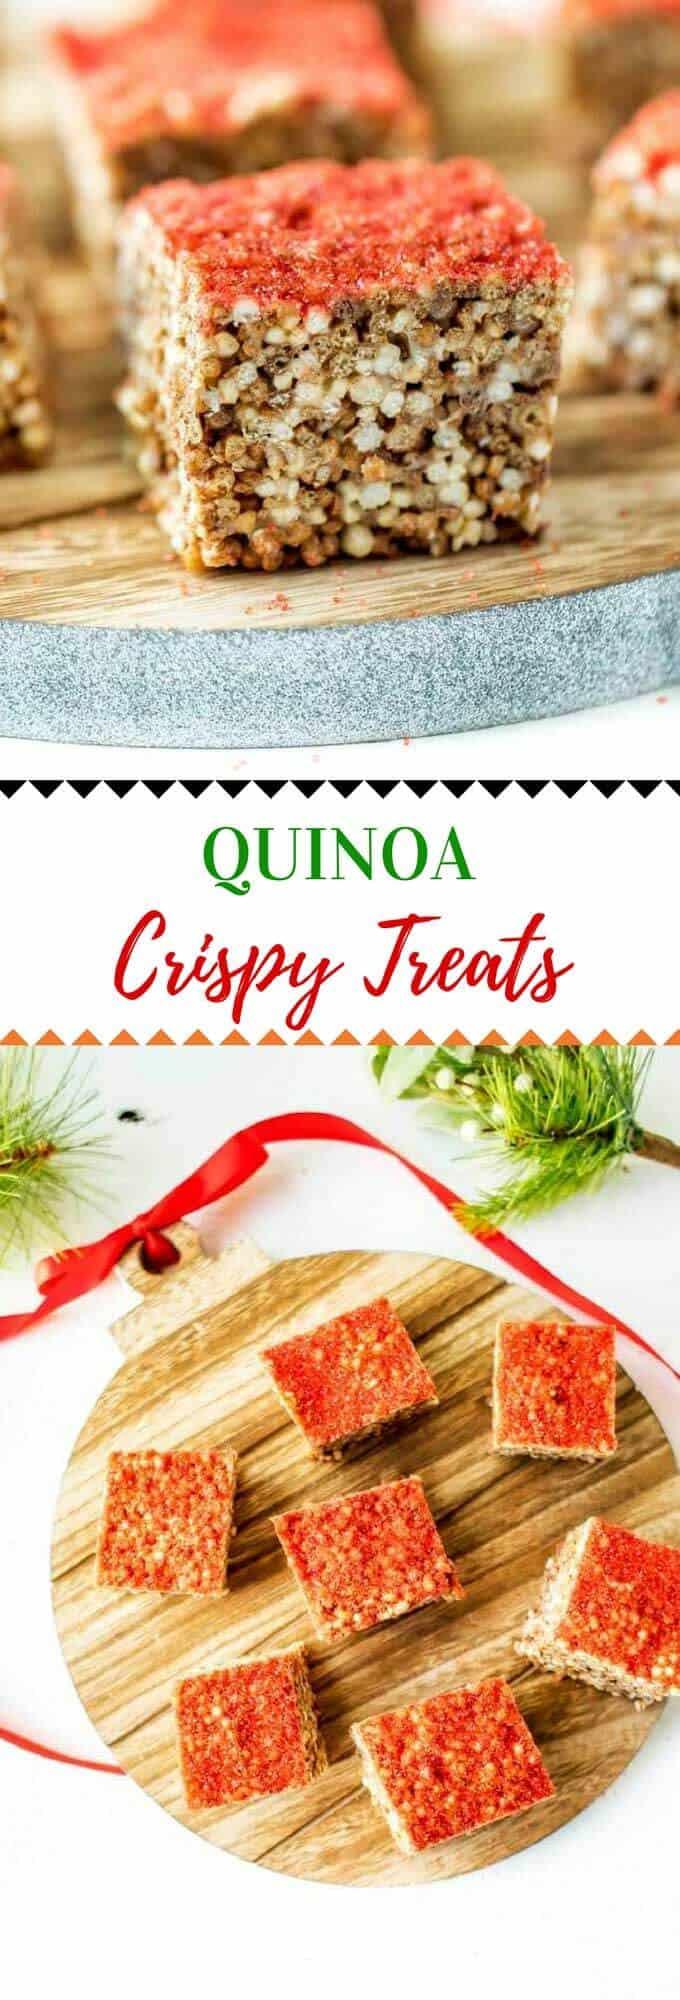 These Quinoa Crispy Treats are a healthier alternative to traditional rice crispy treats. Gluten free and easily made vegan.